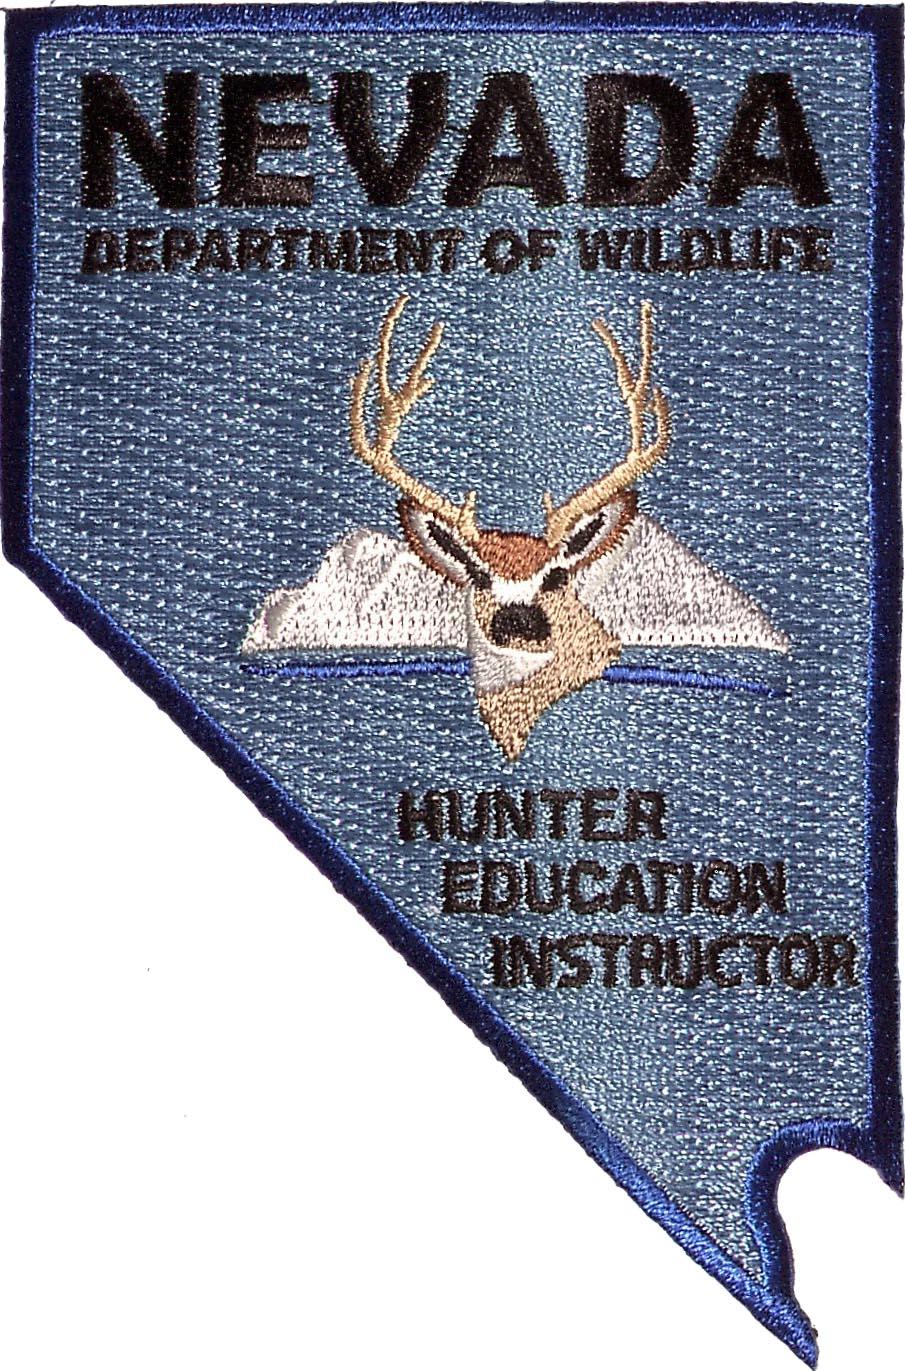 Department of Wildlife Emblem